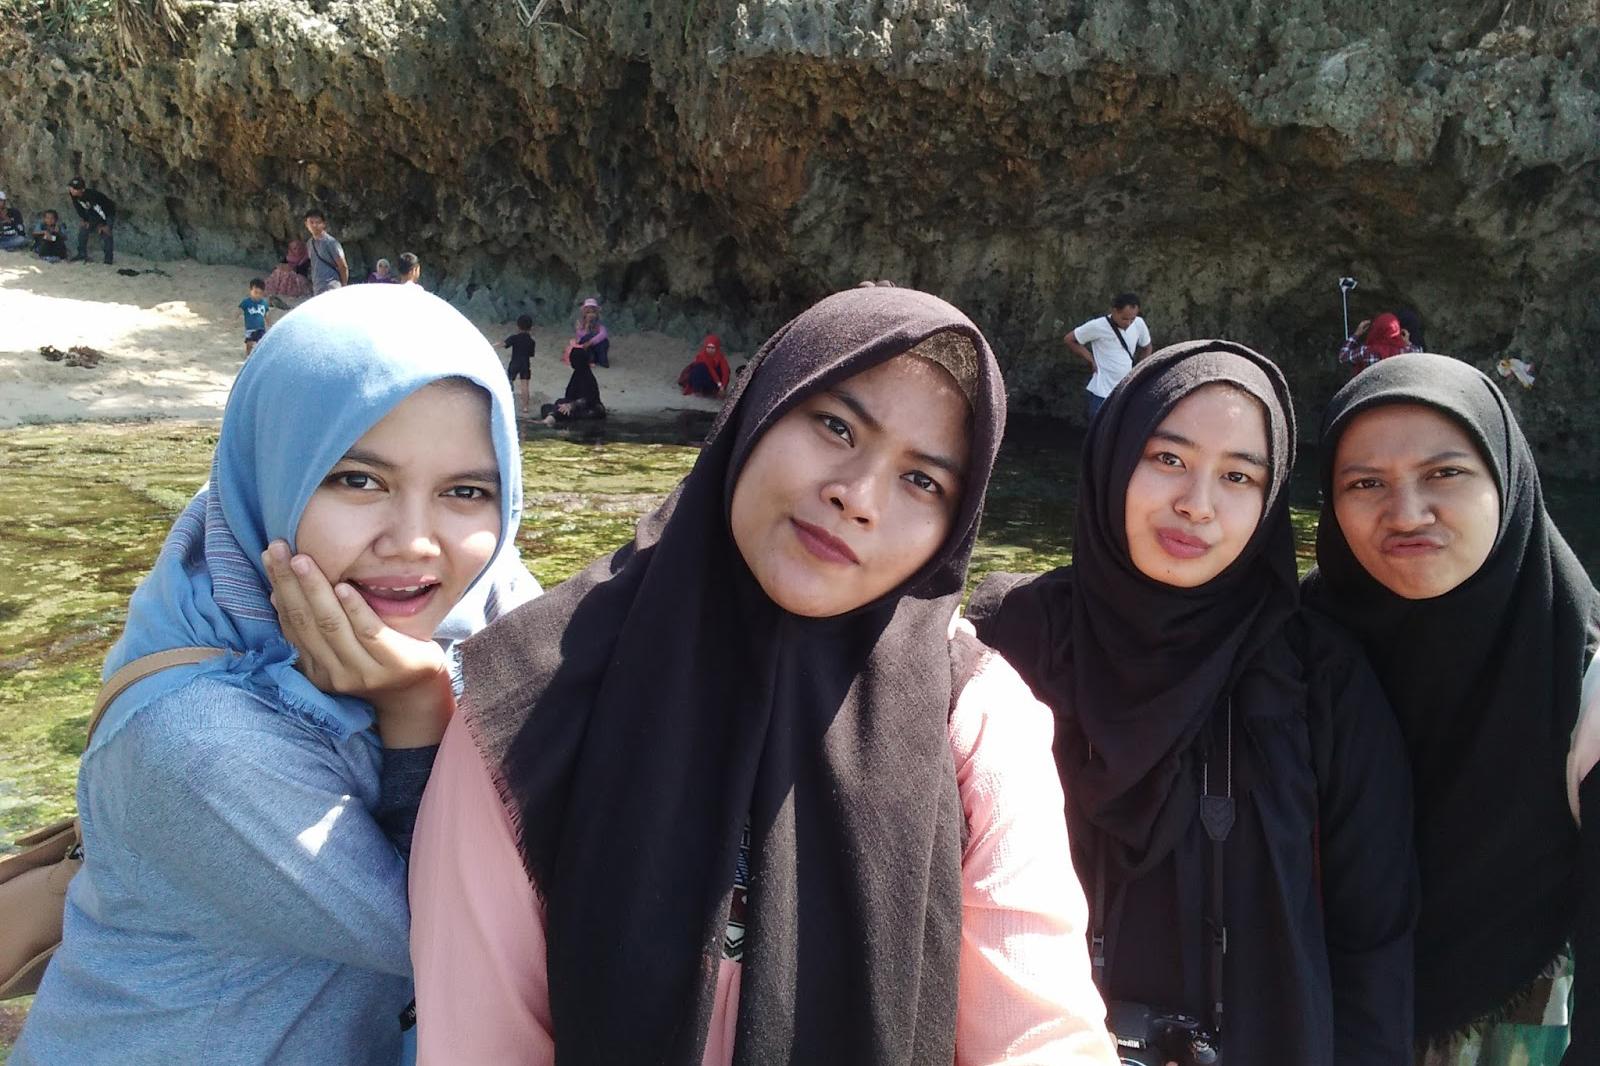 kaos hijab gaul tutorial hijab gaul masa kini kreasi hijab gaul kontroversi hijab gaul hijab gaul modis model hijab gaul wajah snge pelacur